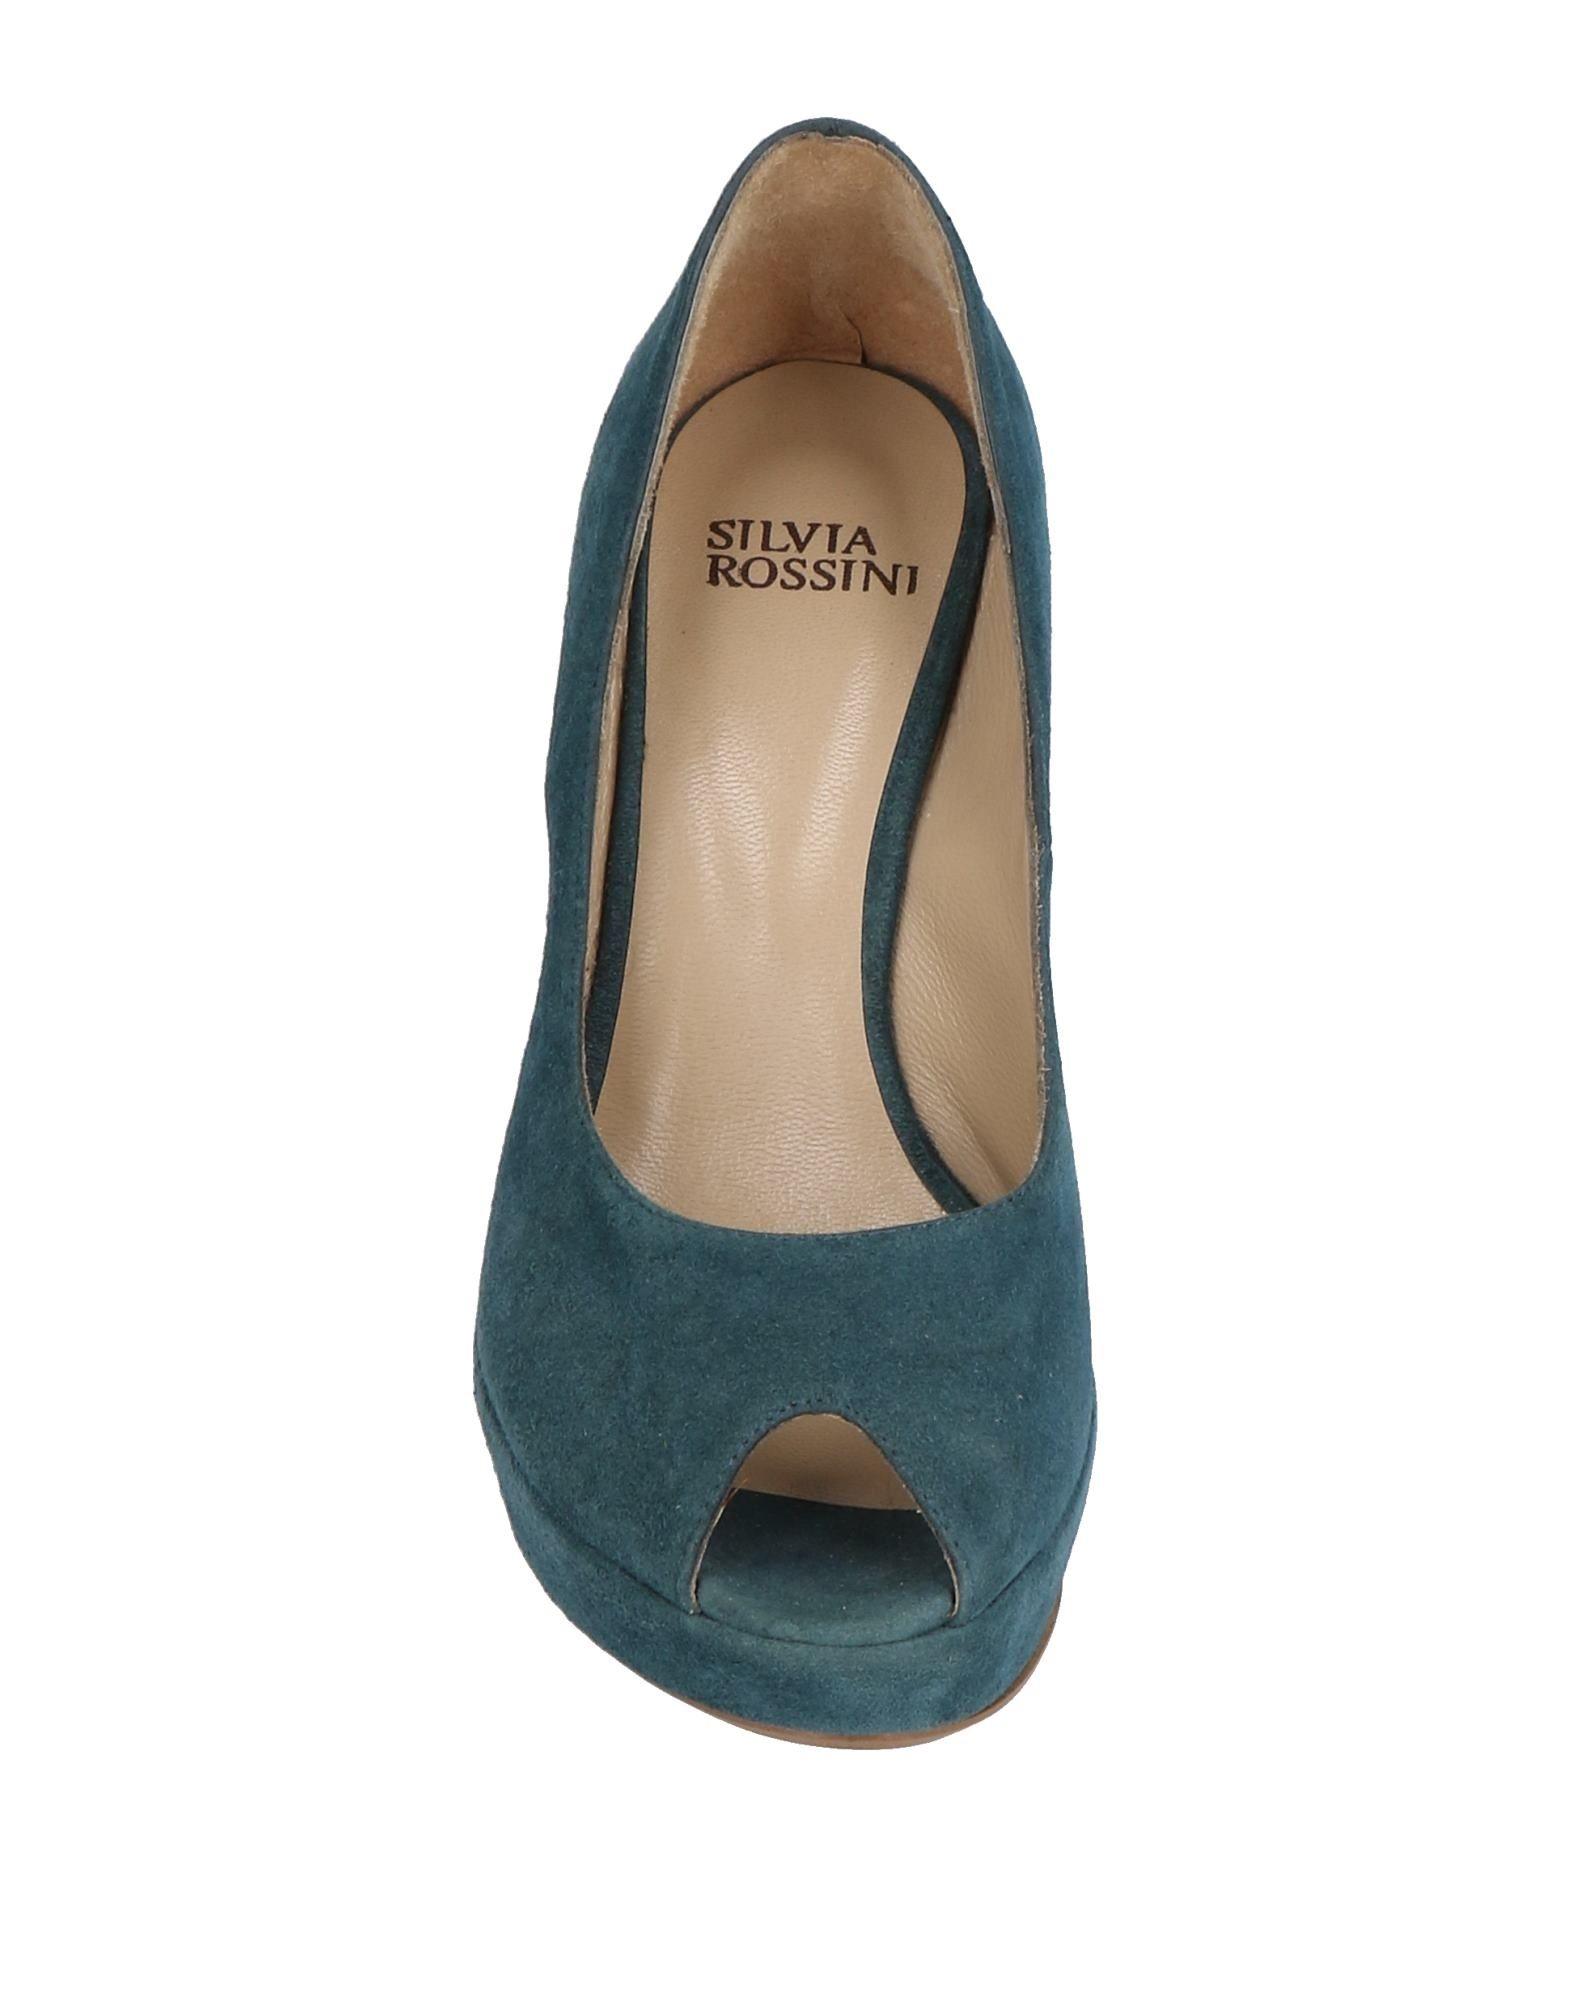 Silvia Rossini Gute Pumps Damen  11502979MH Gute Rossini Qualität beliebte Schuhe fad226